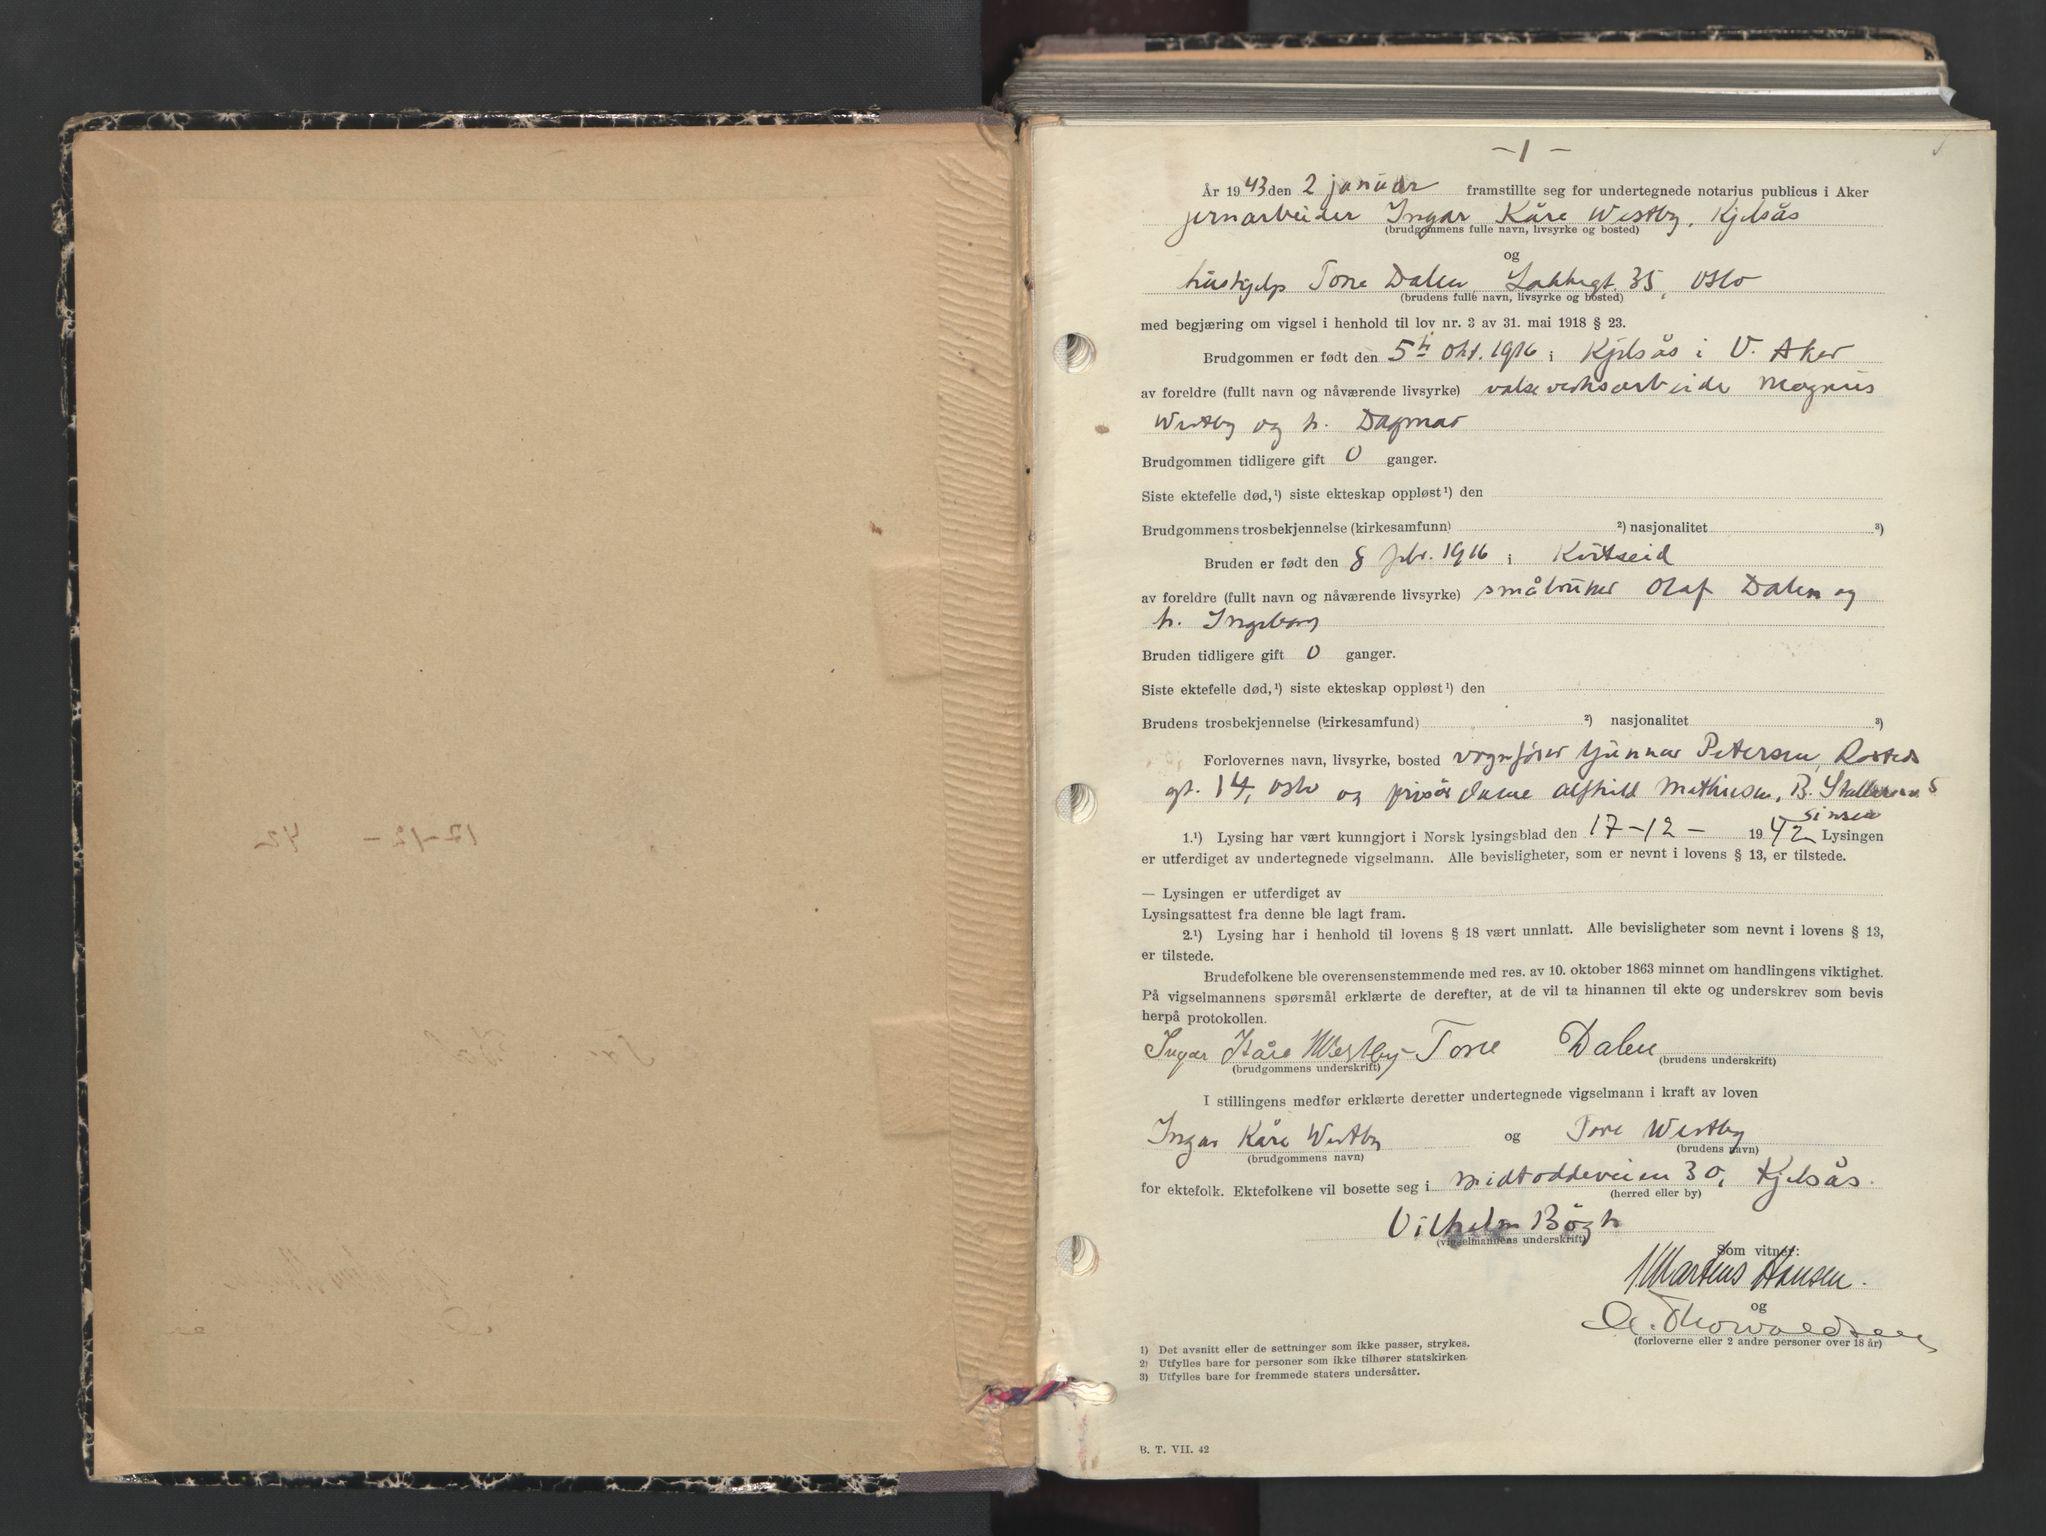 SAO, Aker sorenskriveri, L/Lc/Lcb/L0019: Vigselprotokoll, 1943, s. 1